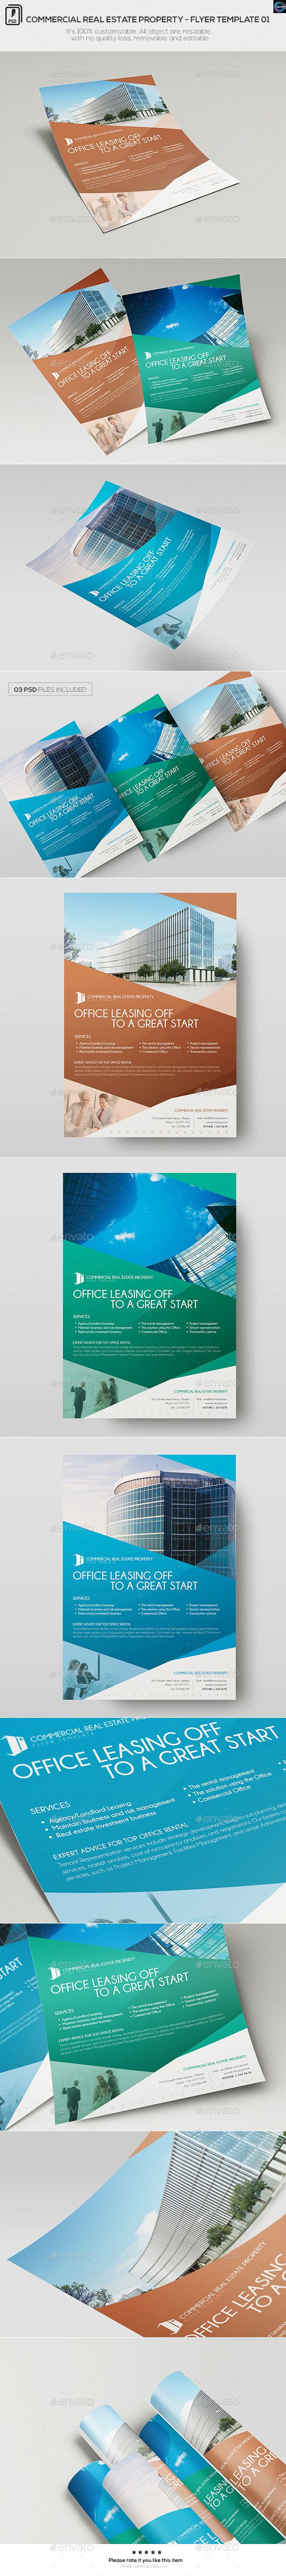 best 25 real estate flyers ideas on pinterest real estate flyer template real estate. Black Bedroom Furniture Sets. Home Design Ideas